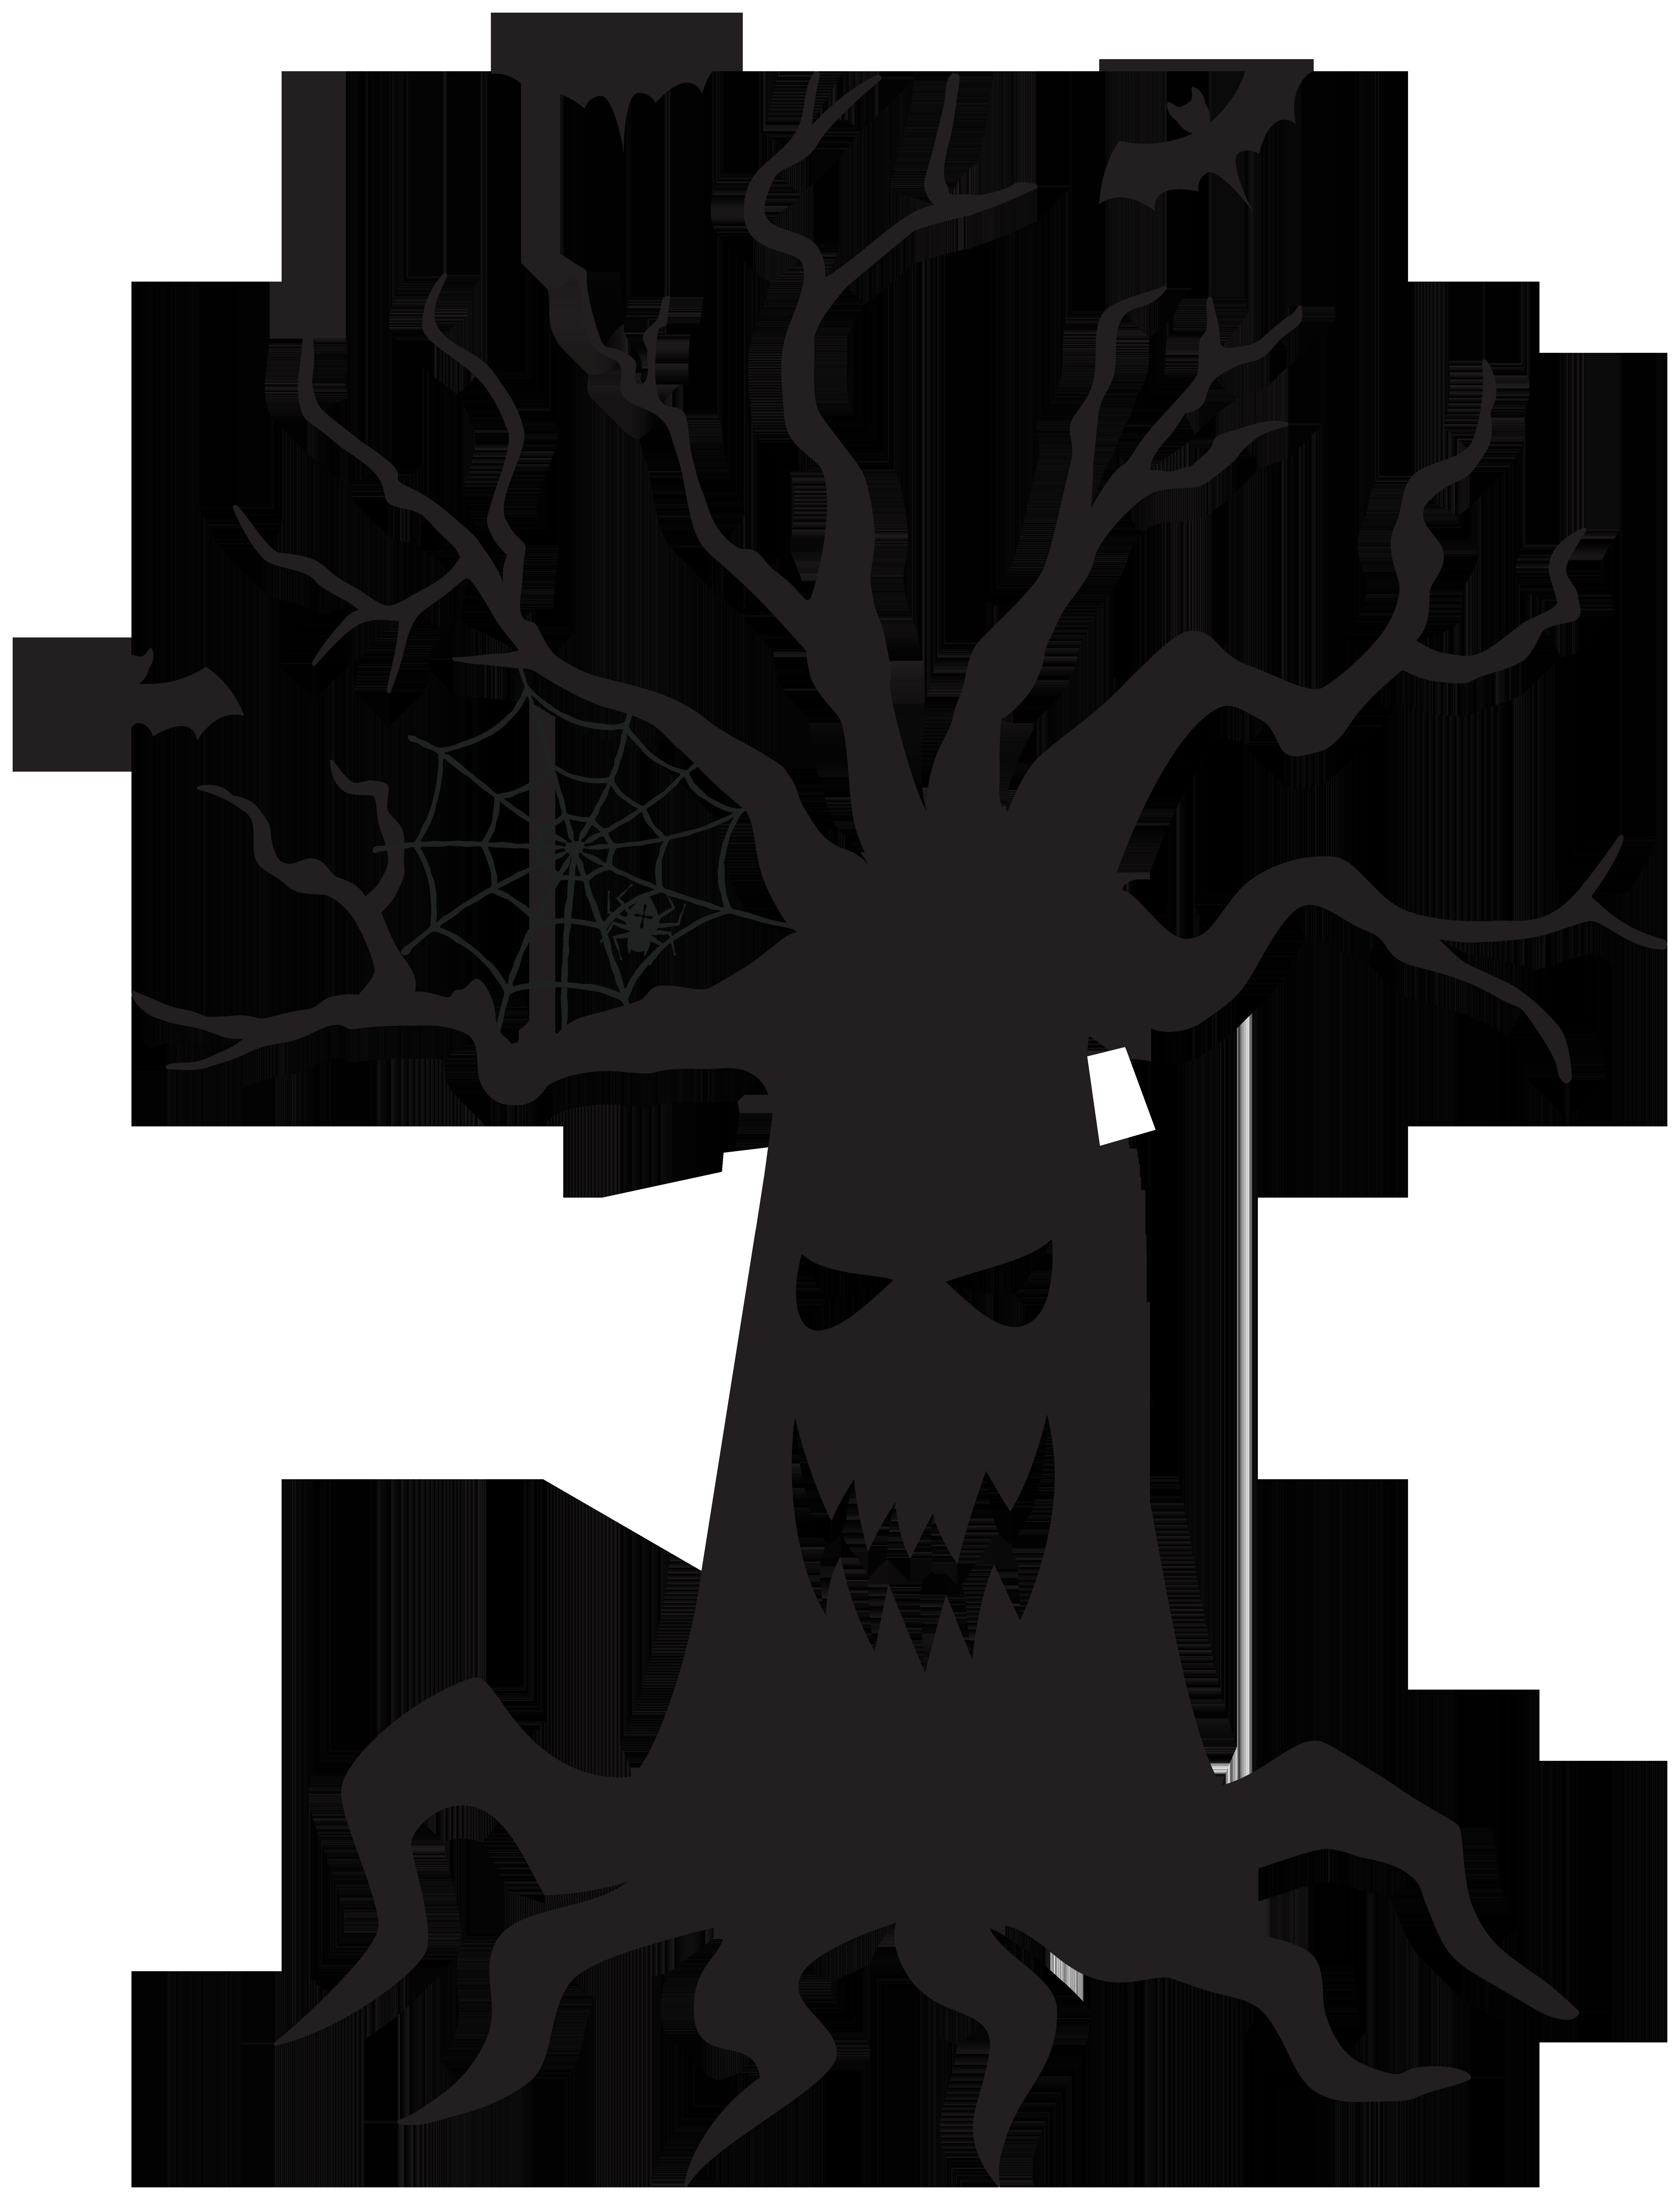 Arbol Png By Valeswagcomeoreos Deviantart Com On Deviantart Tree Drawing Tree Drawings Pencil Silhouette Drawing